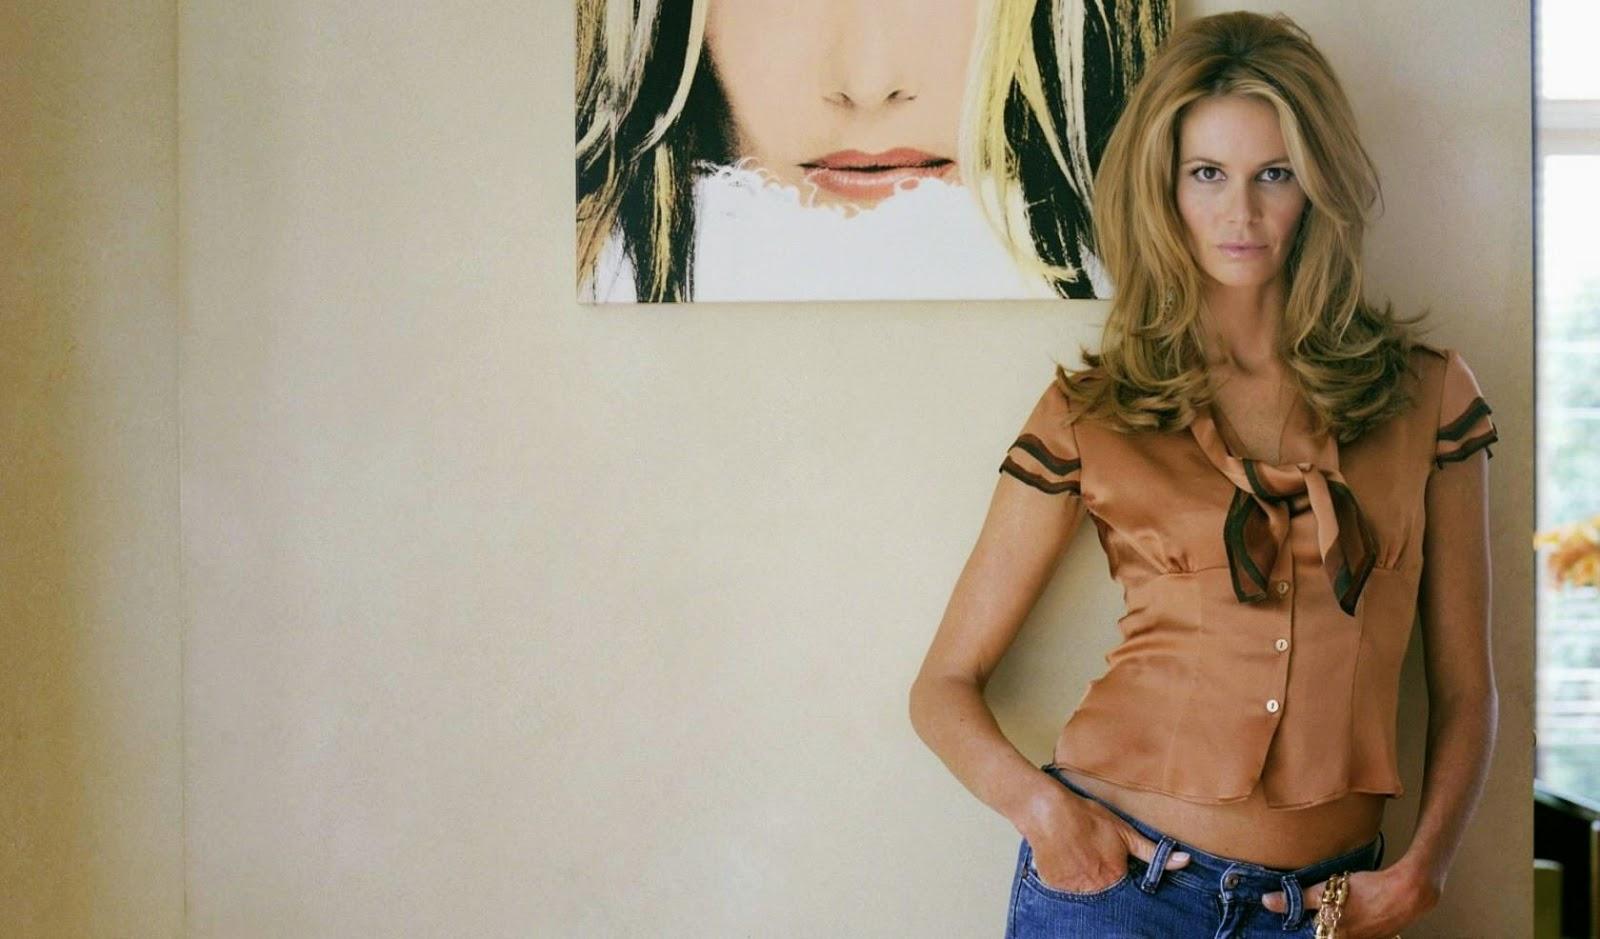 Elle Macpherson Hd Wallpapers Free Download